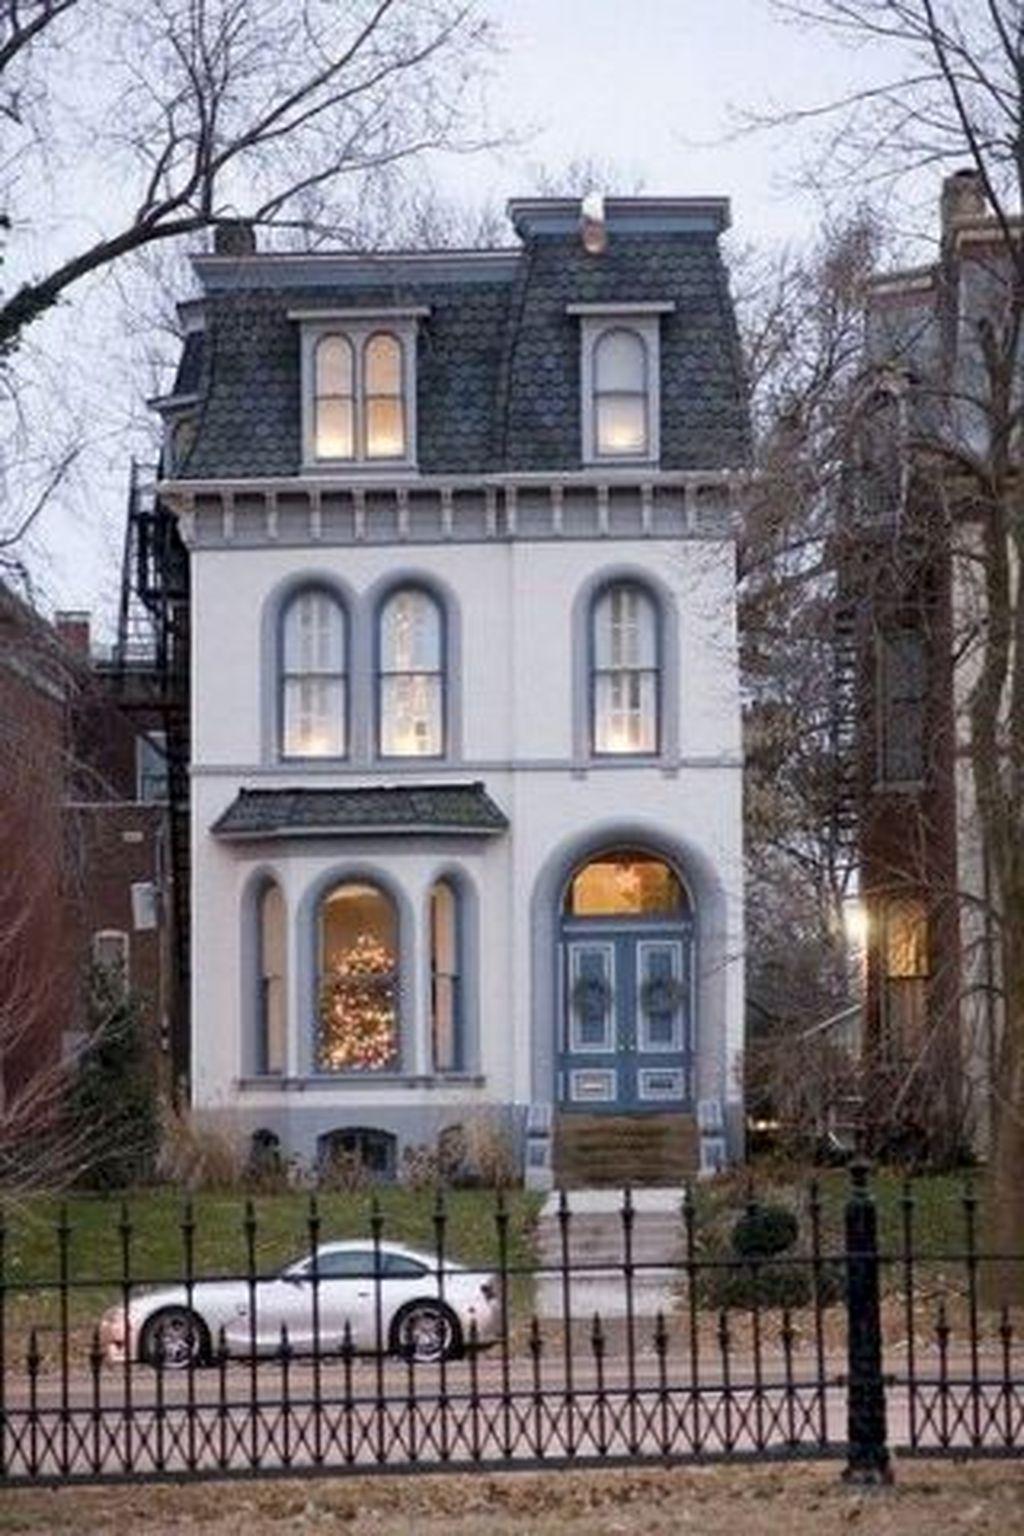 The Best Victorian Homes Design Ideas 05 Victorian House Colors Victorian Homes Old House Design